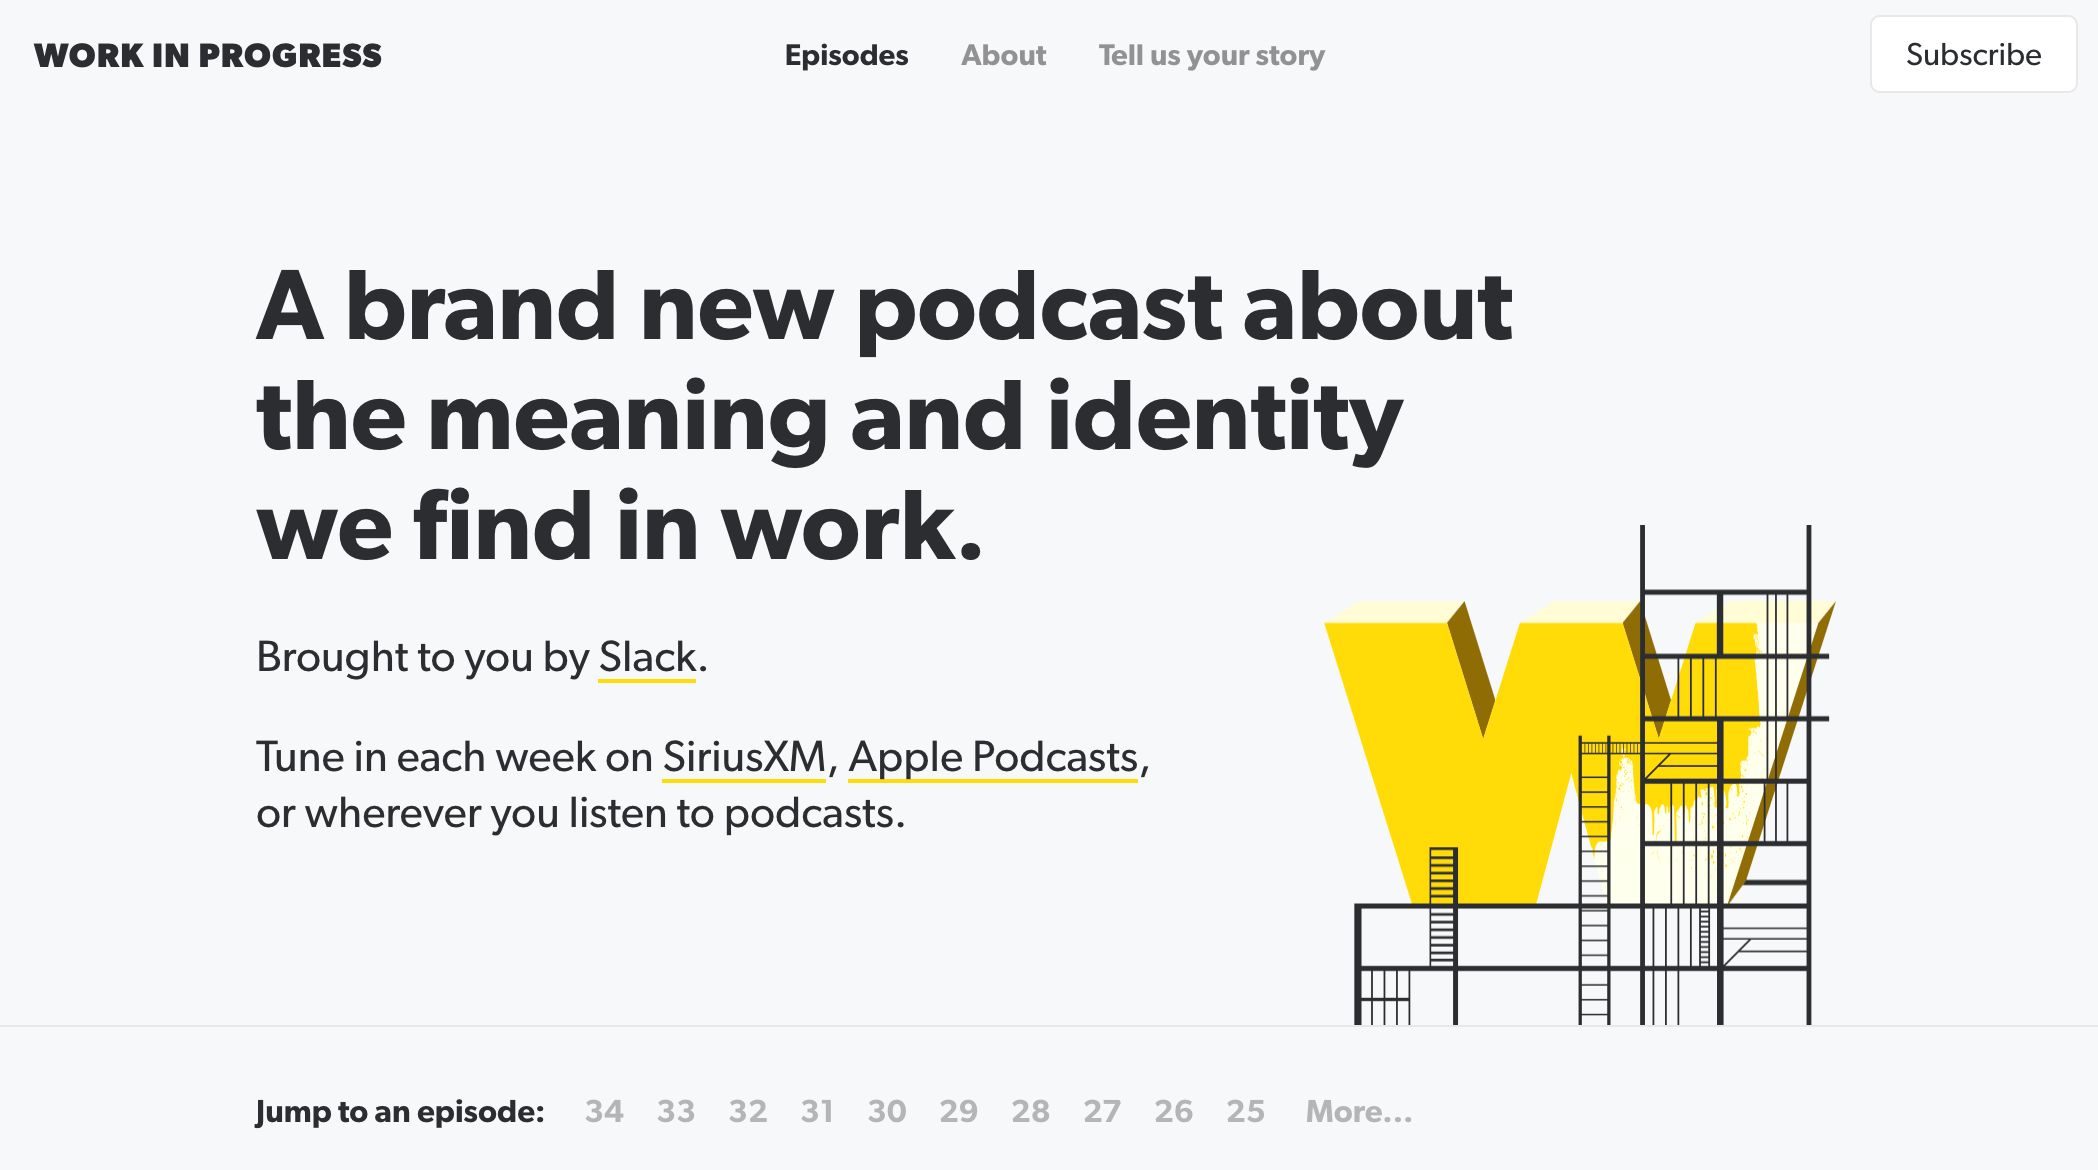 SlackWorkInProgressPodcast